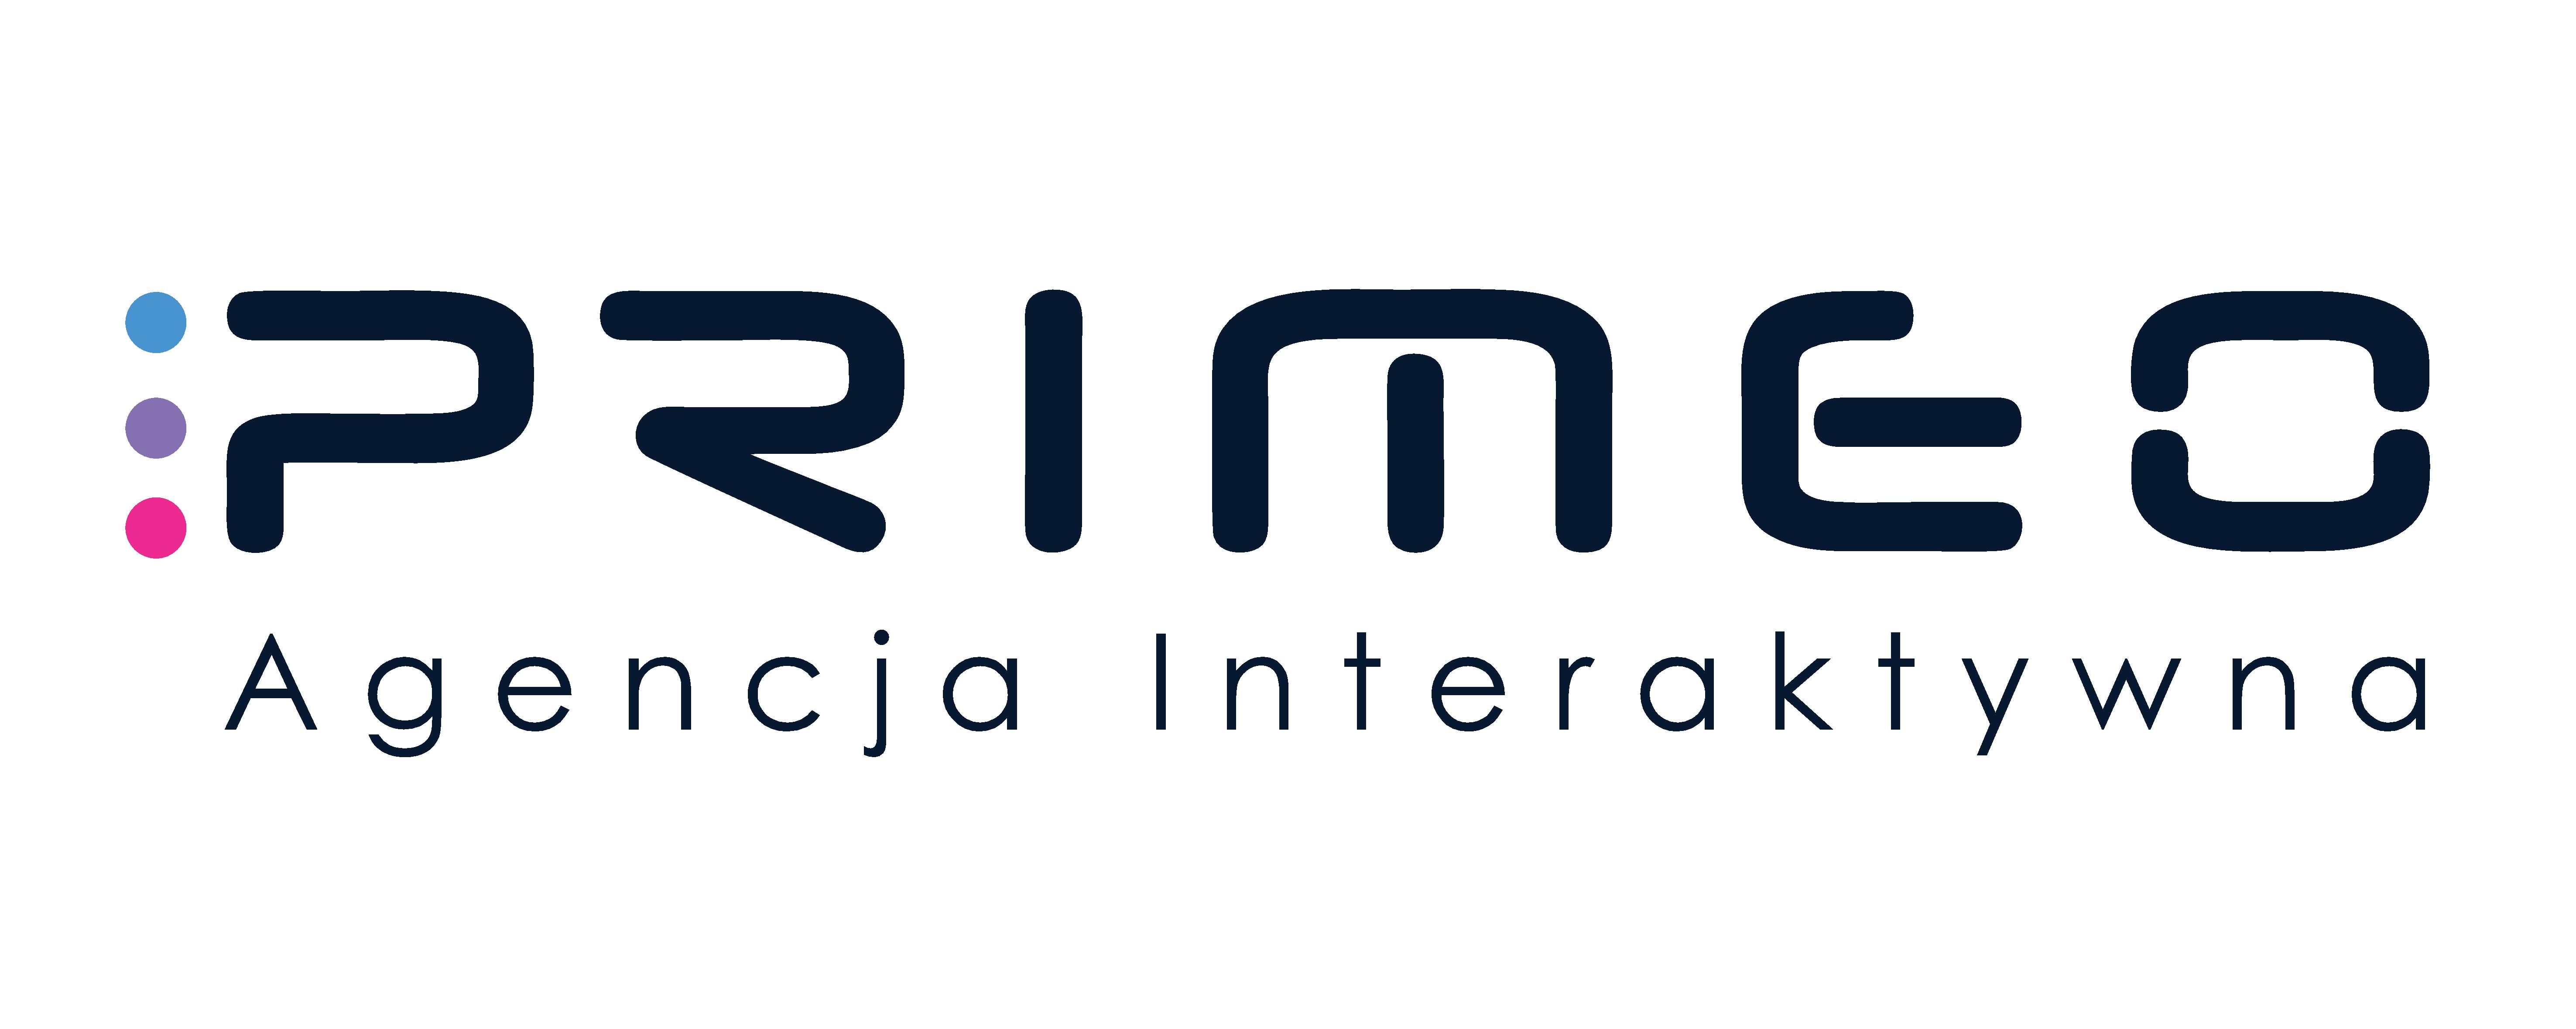 PRIMEO Agencja Interaktywna